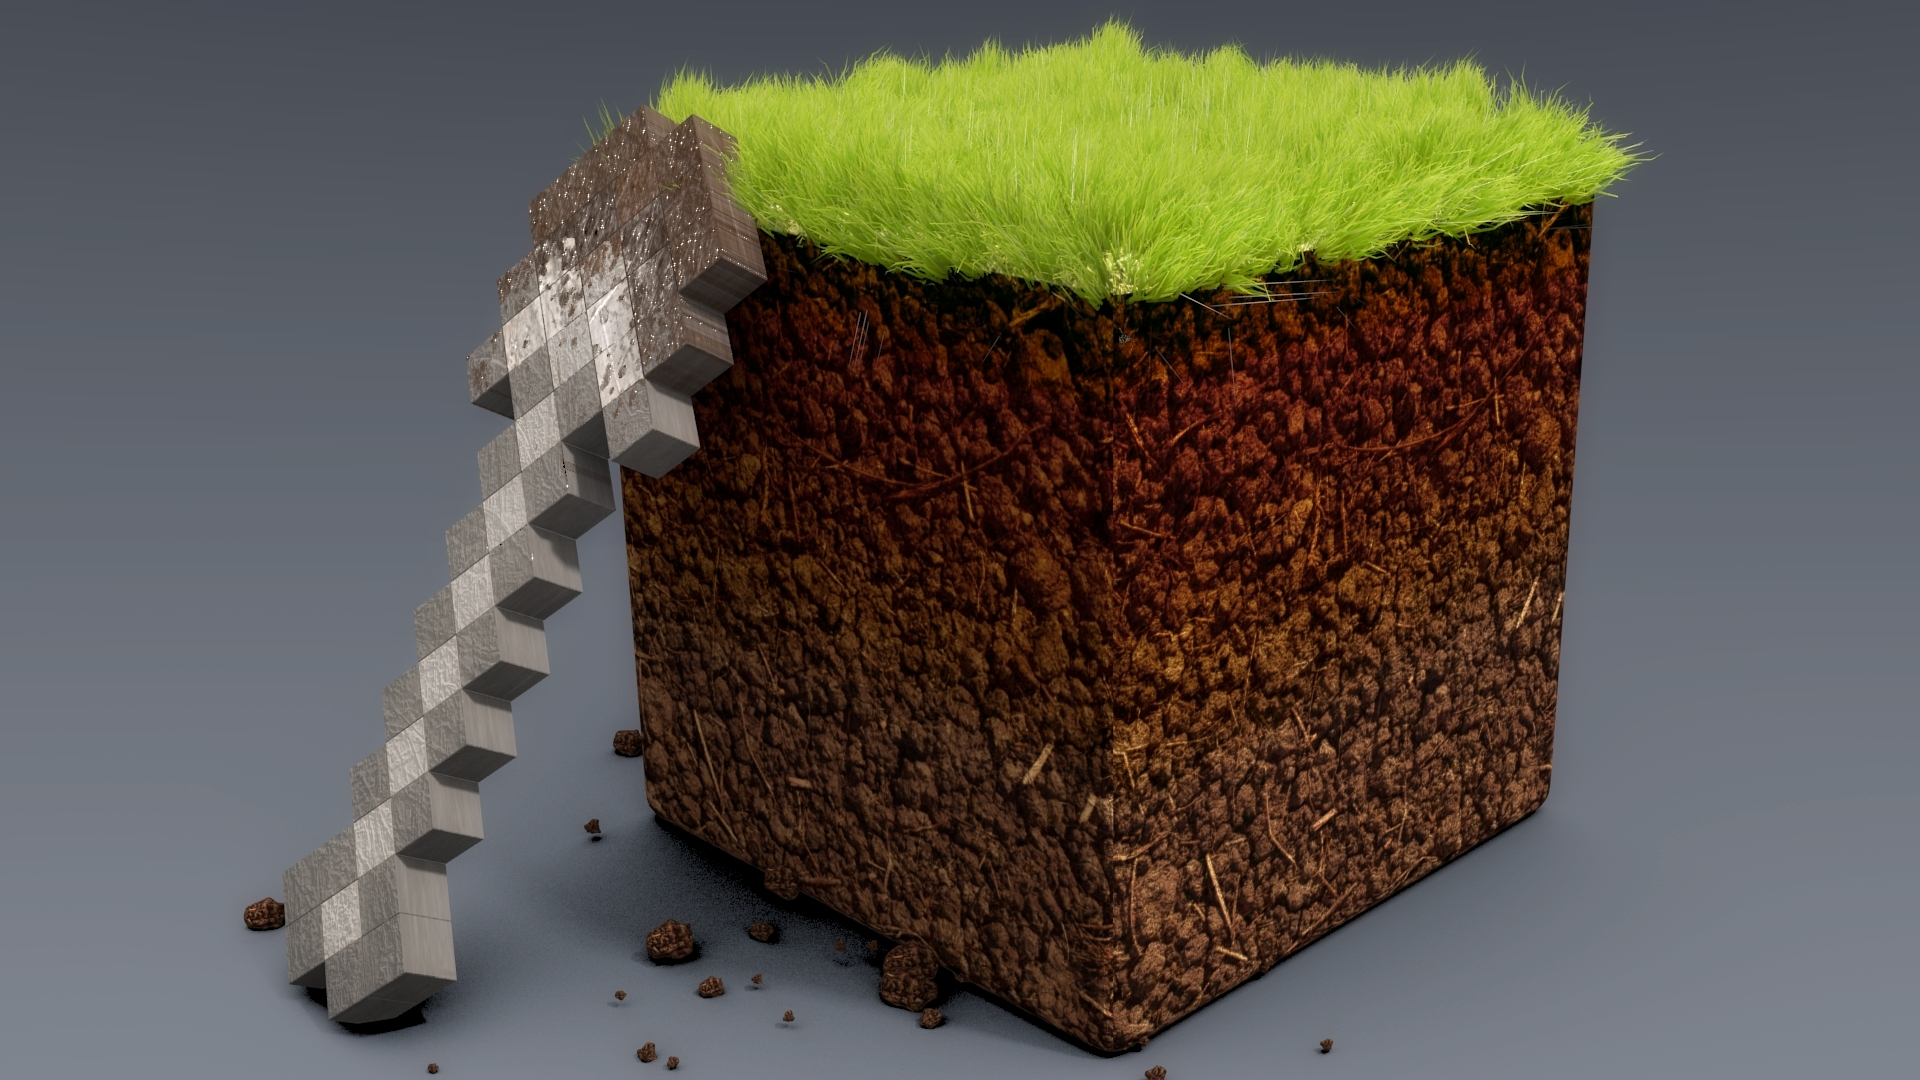 Full HD 1080p Minecraft Wallpapers HD, Desktop Backgrounds